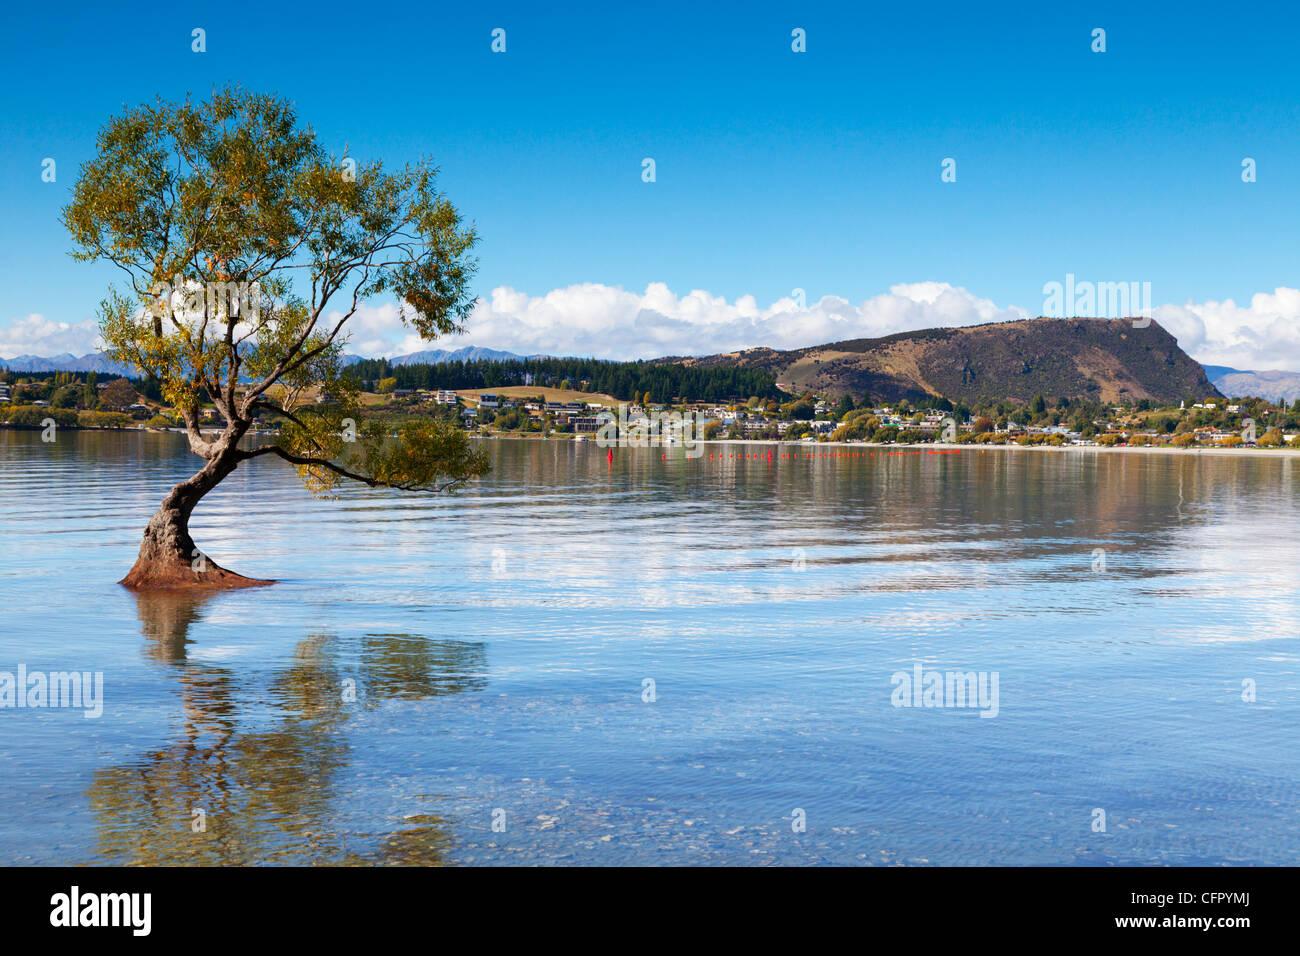 Late afternoon at Lake Wanaka, Otago, New Zealand. Stock Photo